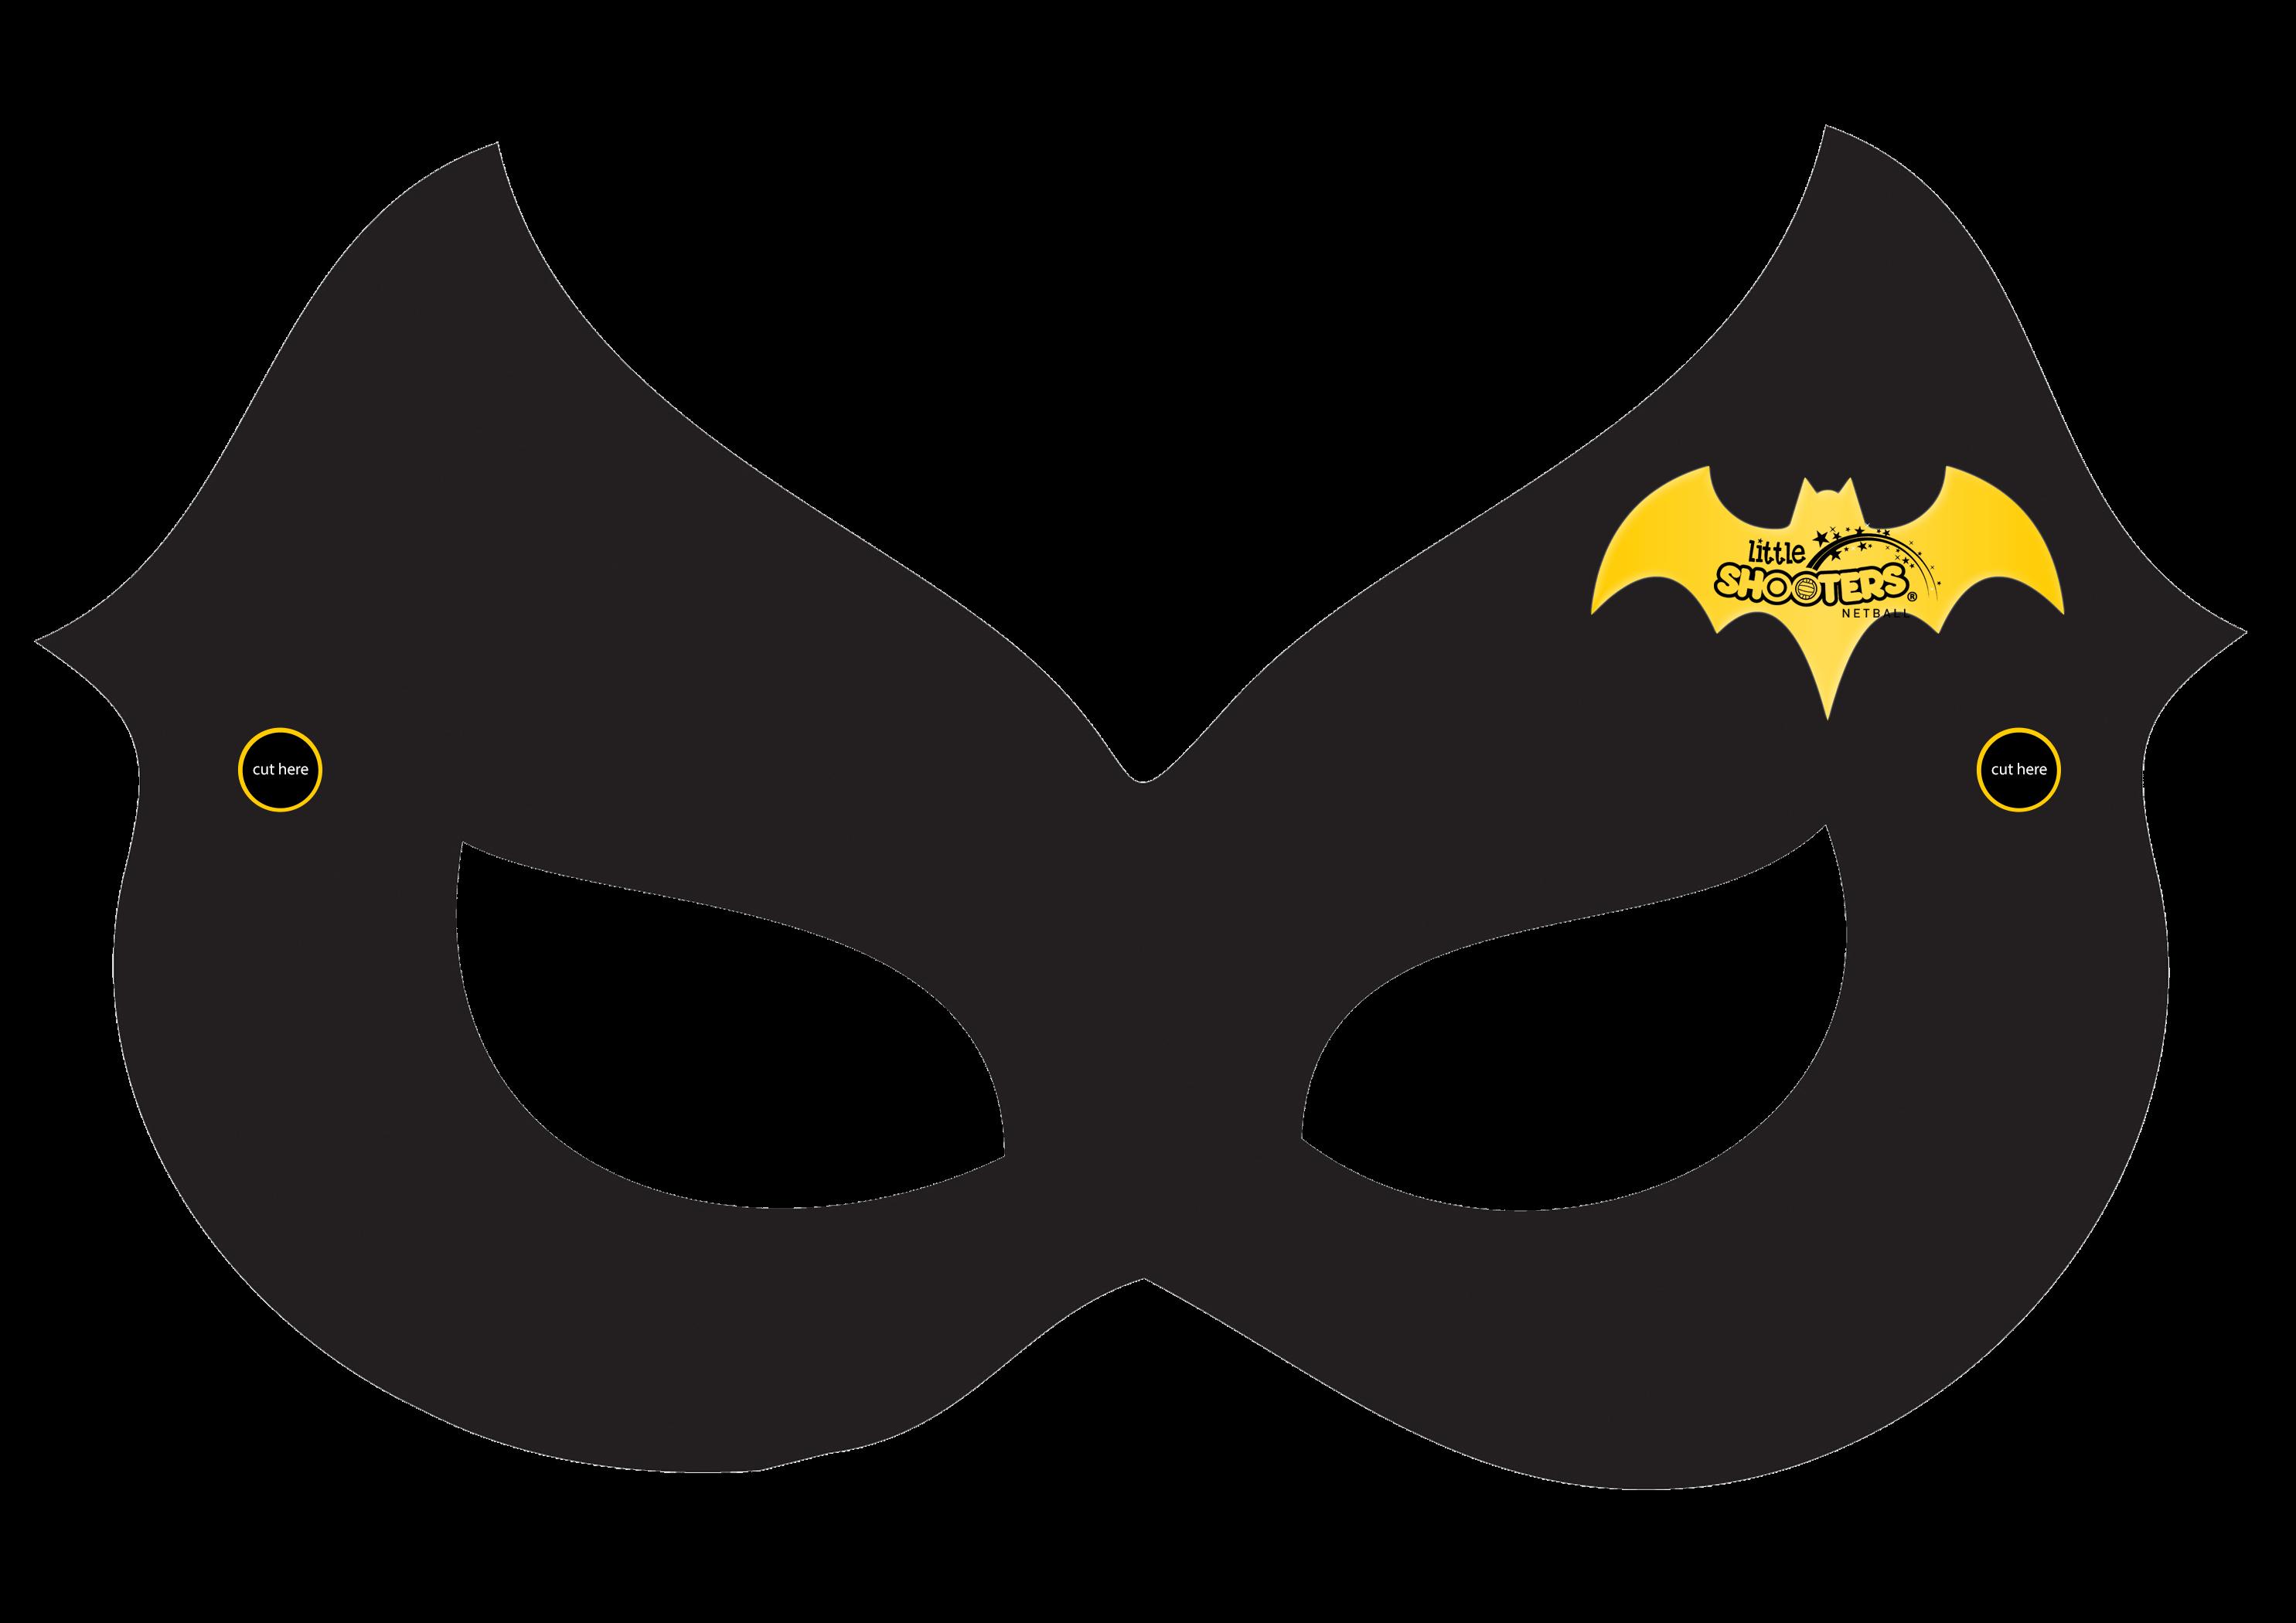 Mask clipart batgirl Calling All Netball Shooters Superheroes!